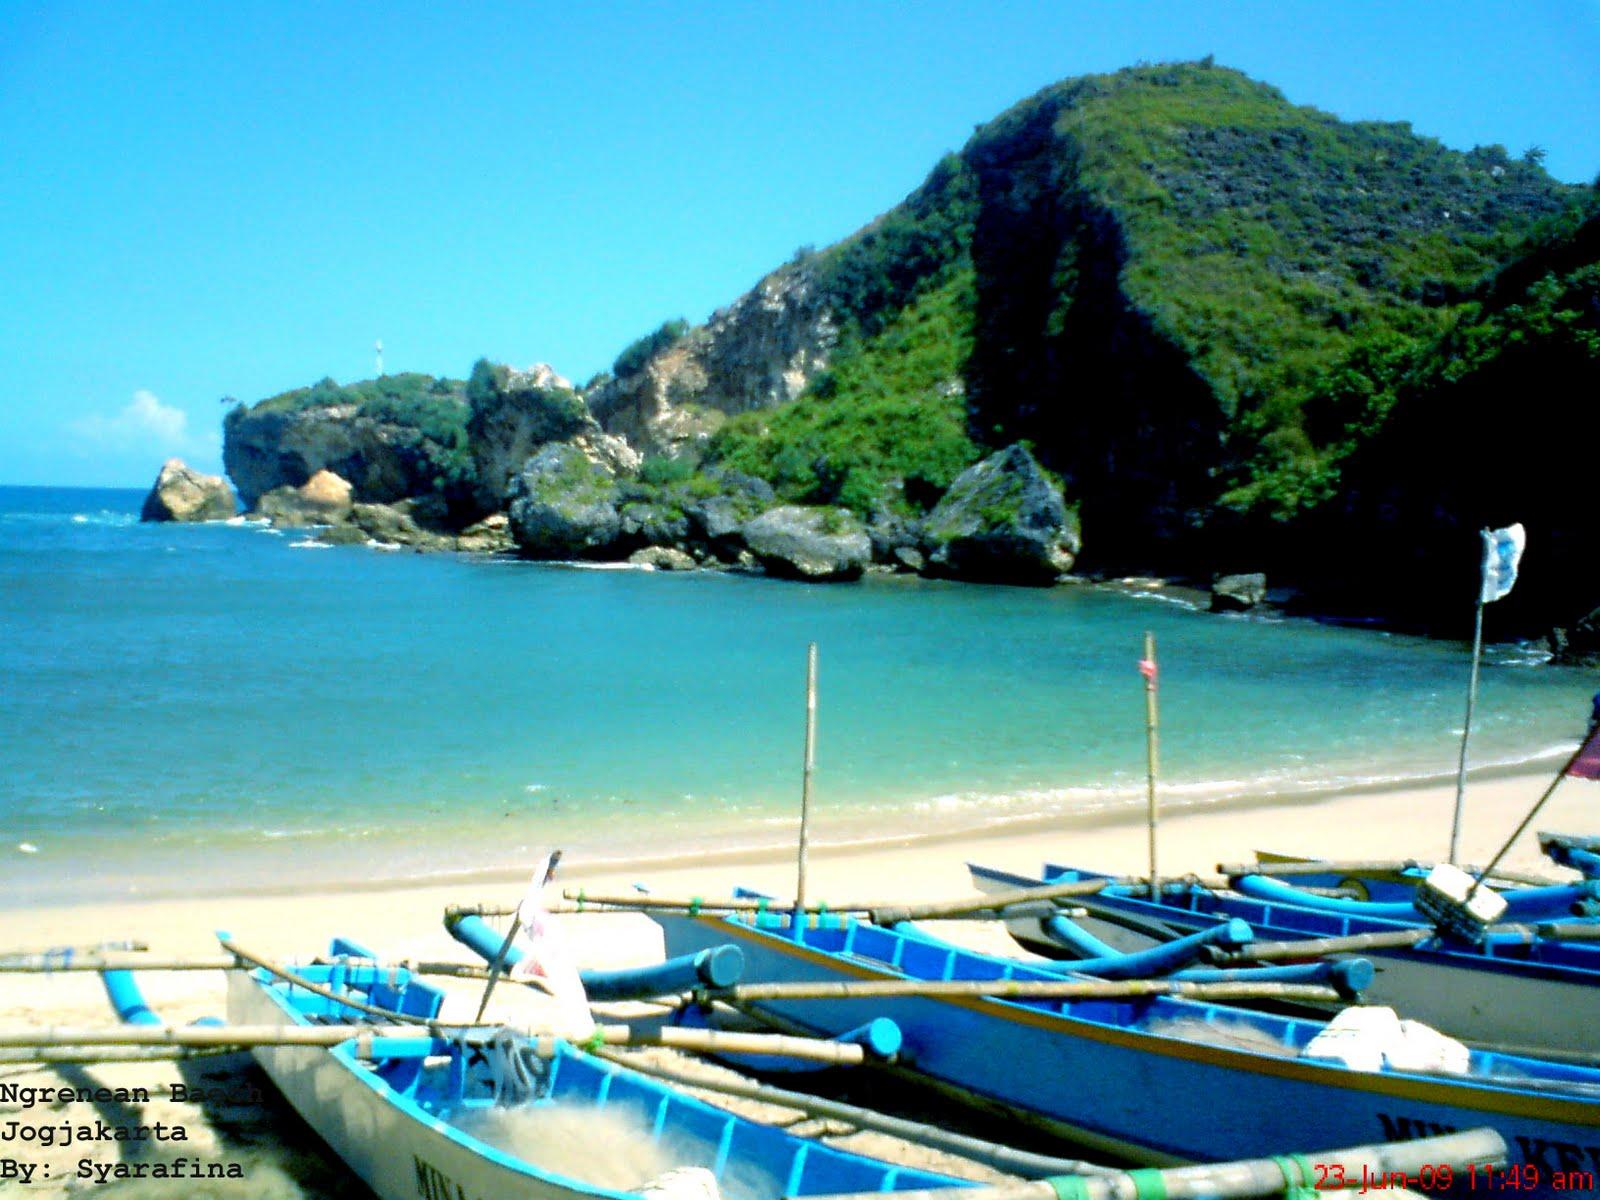 Pantai Ngrenean (c) Syarafina